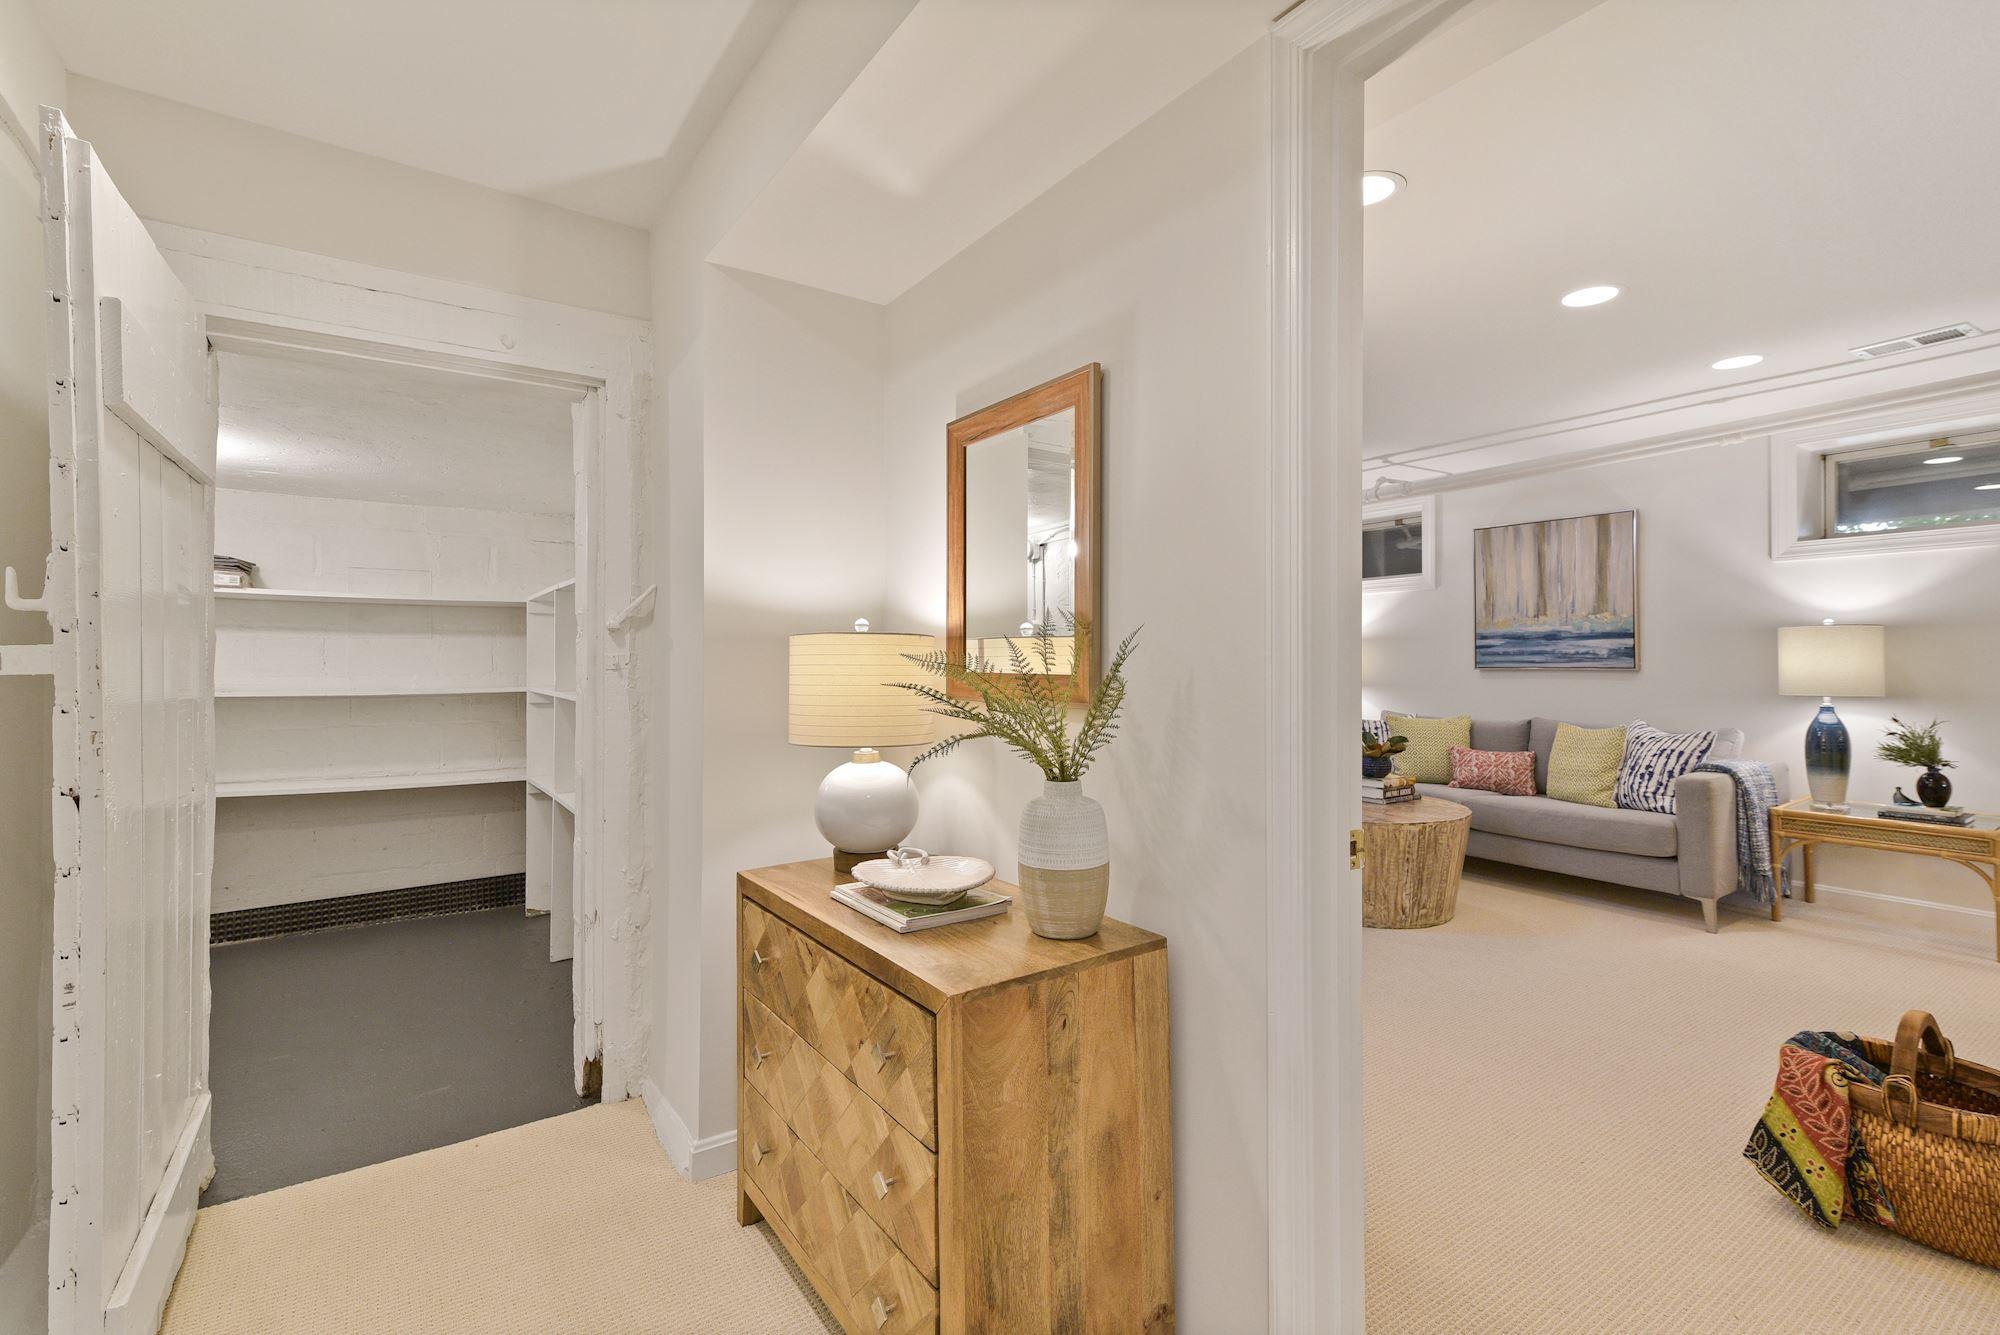 3620 Raymond Street,Chevy Chase,Maryland 20815,6 Bedrooms Bedrooms,4 BathroomsBathrooms,Single Family Home,Raymond Street,1064